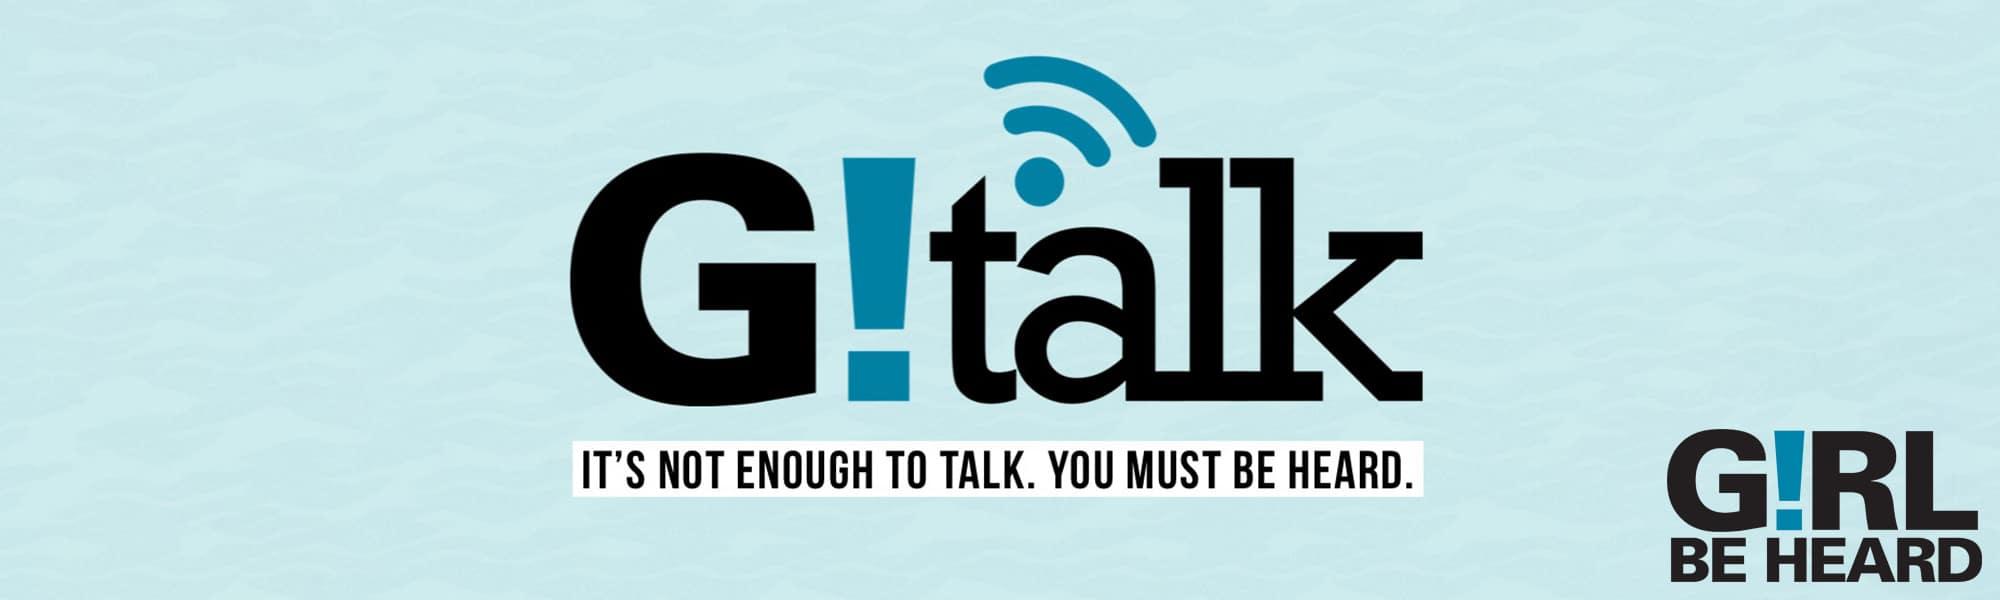 G!RL BE HEARD's G!Talk - GIRL BE HEARD GTALK